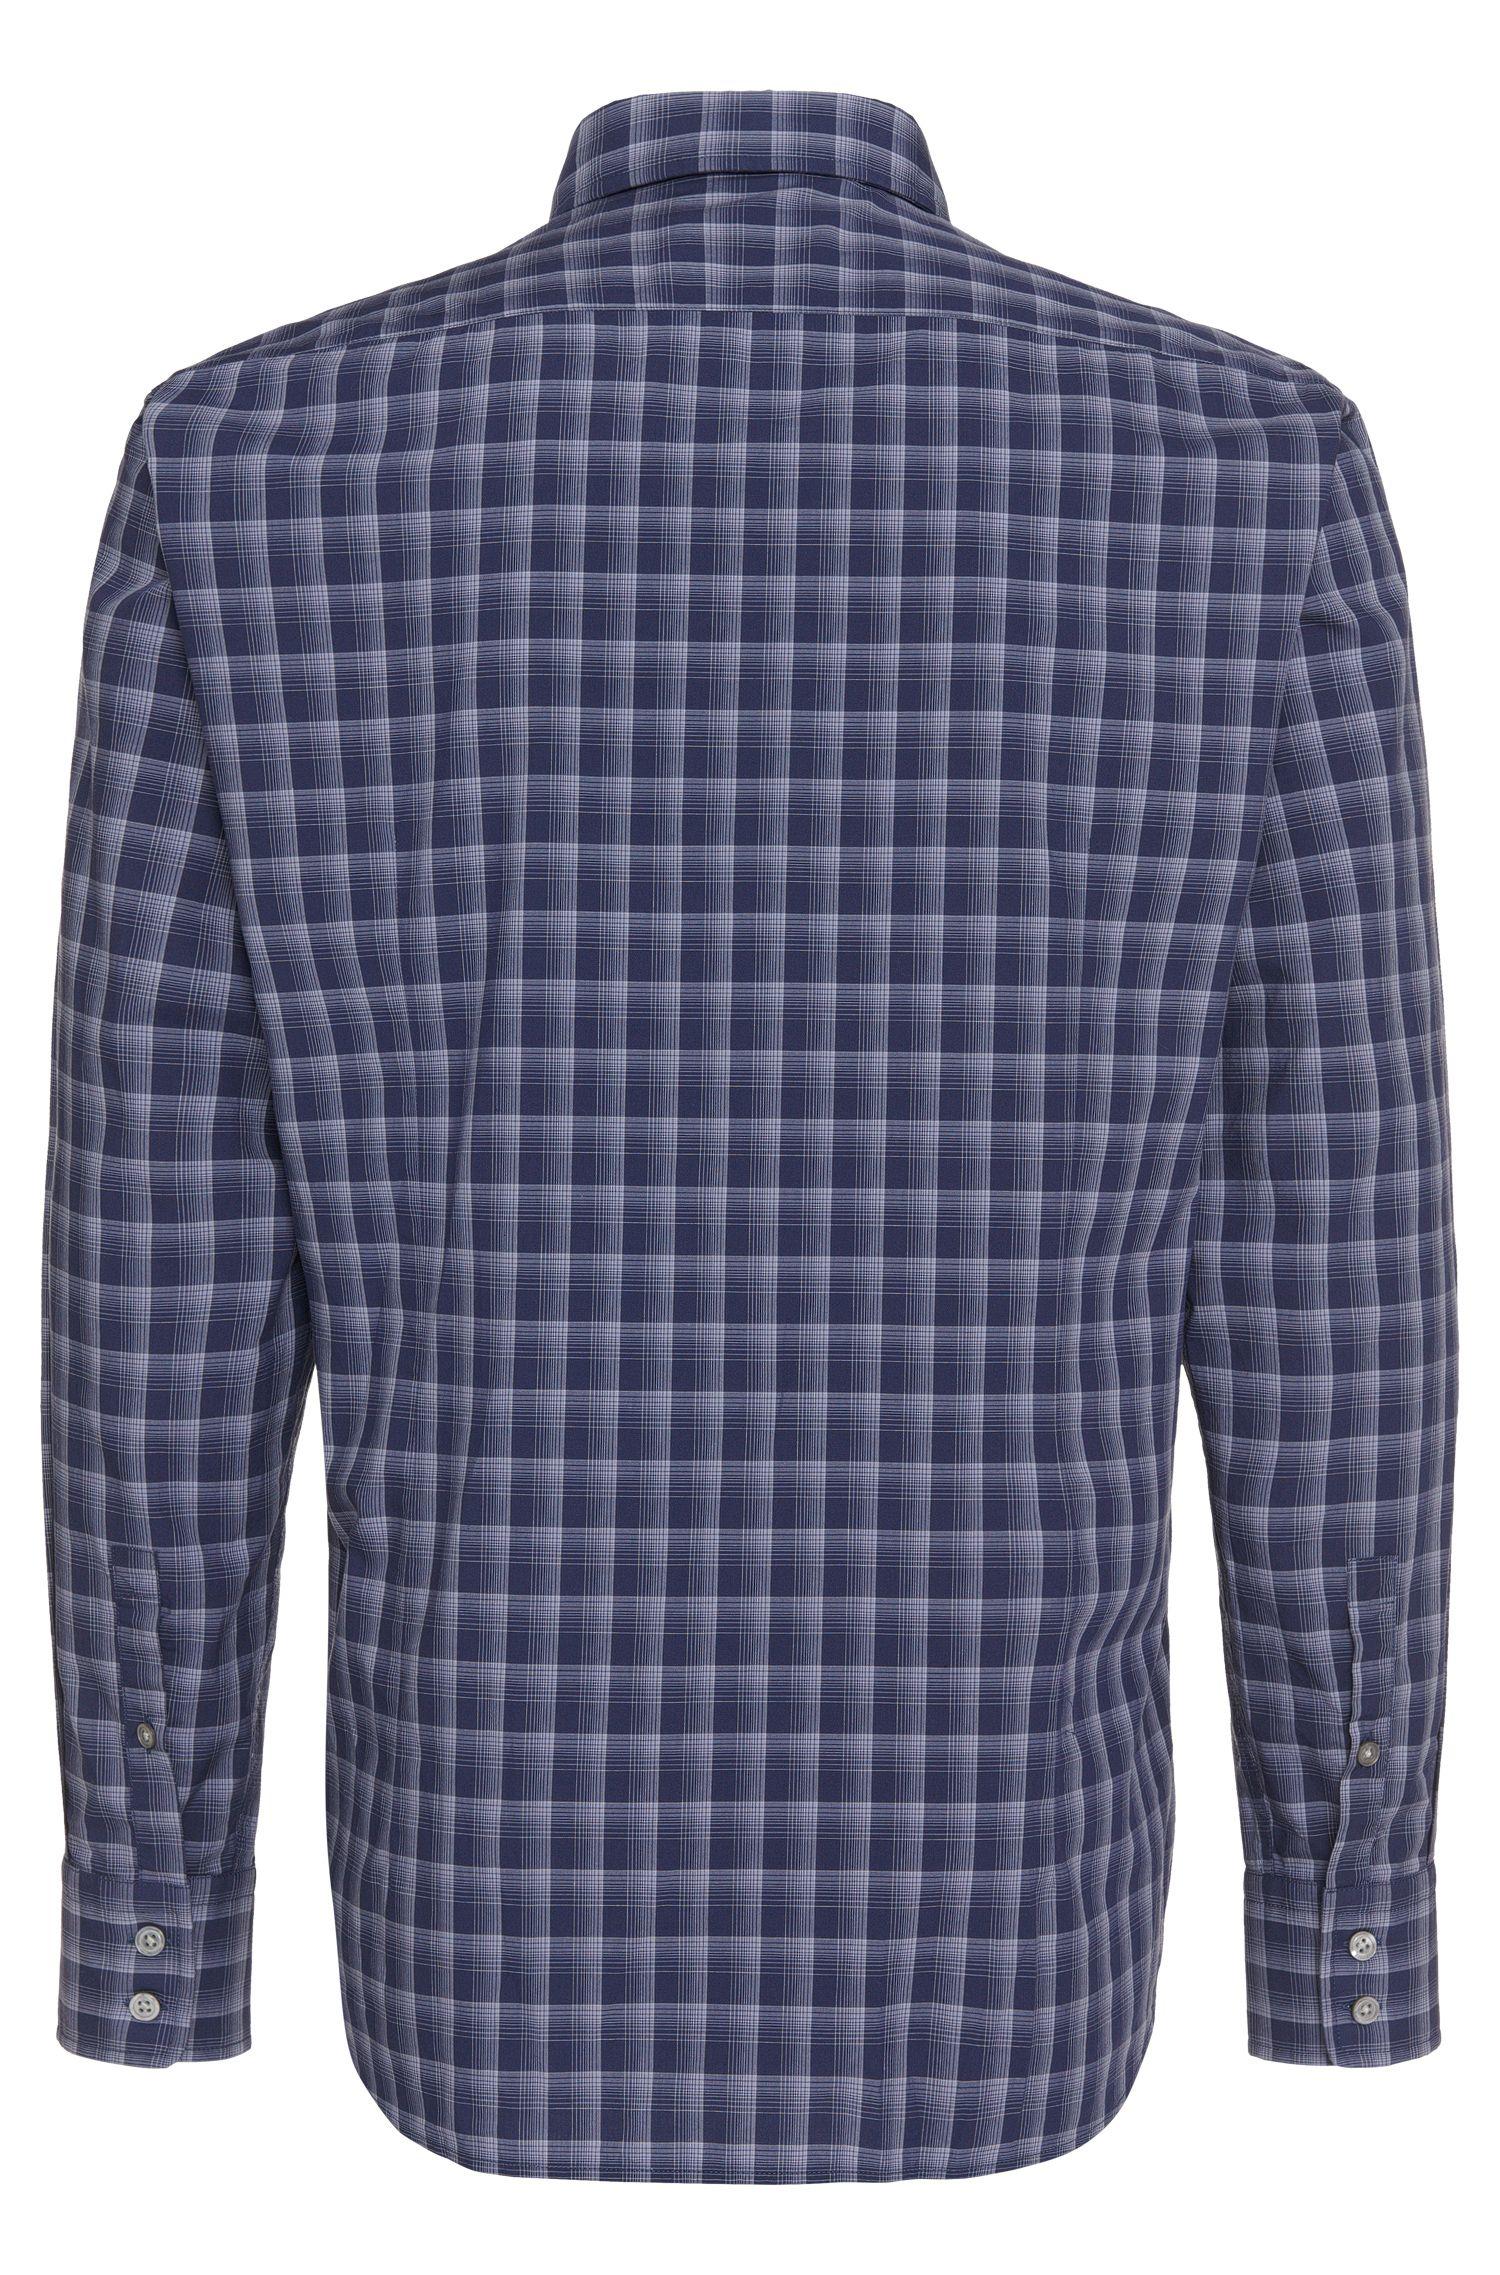 Kariertes Regular-Fit Hemd aus Baumwolle: 'Lukas_5'